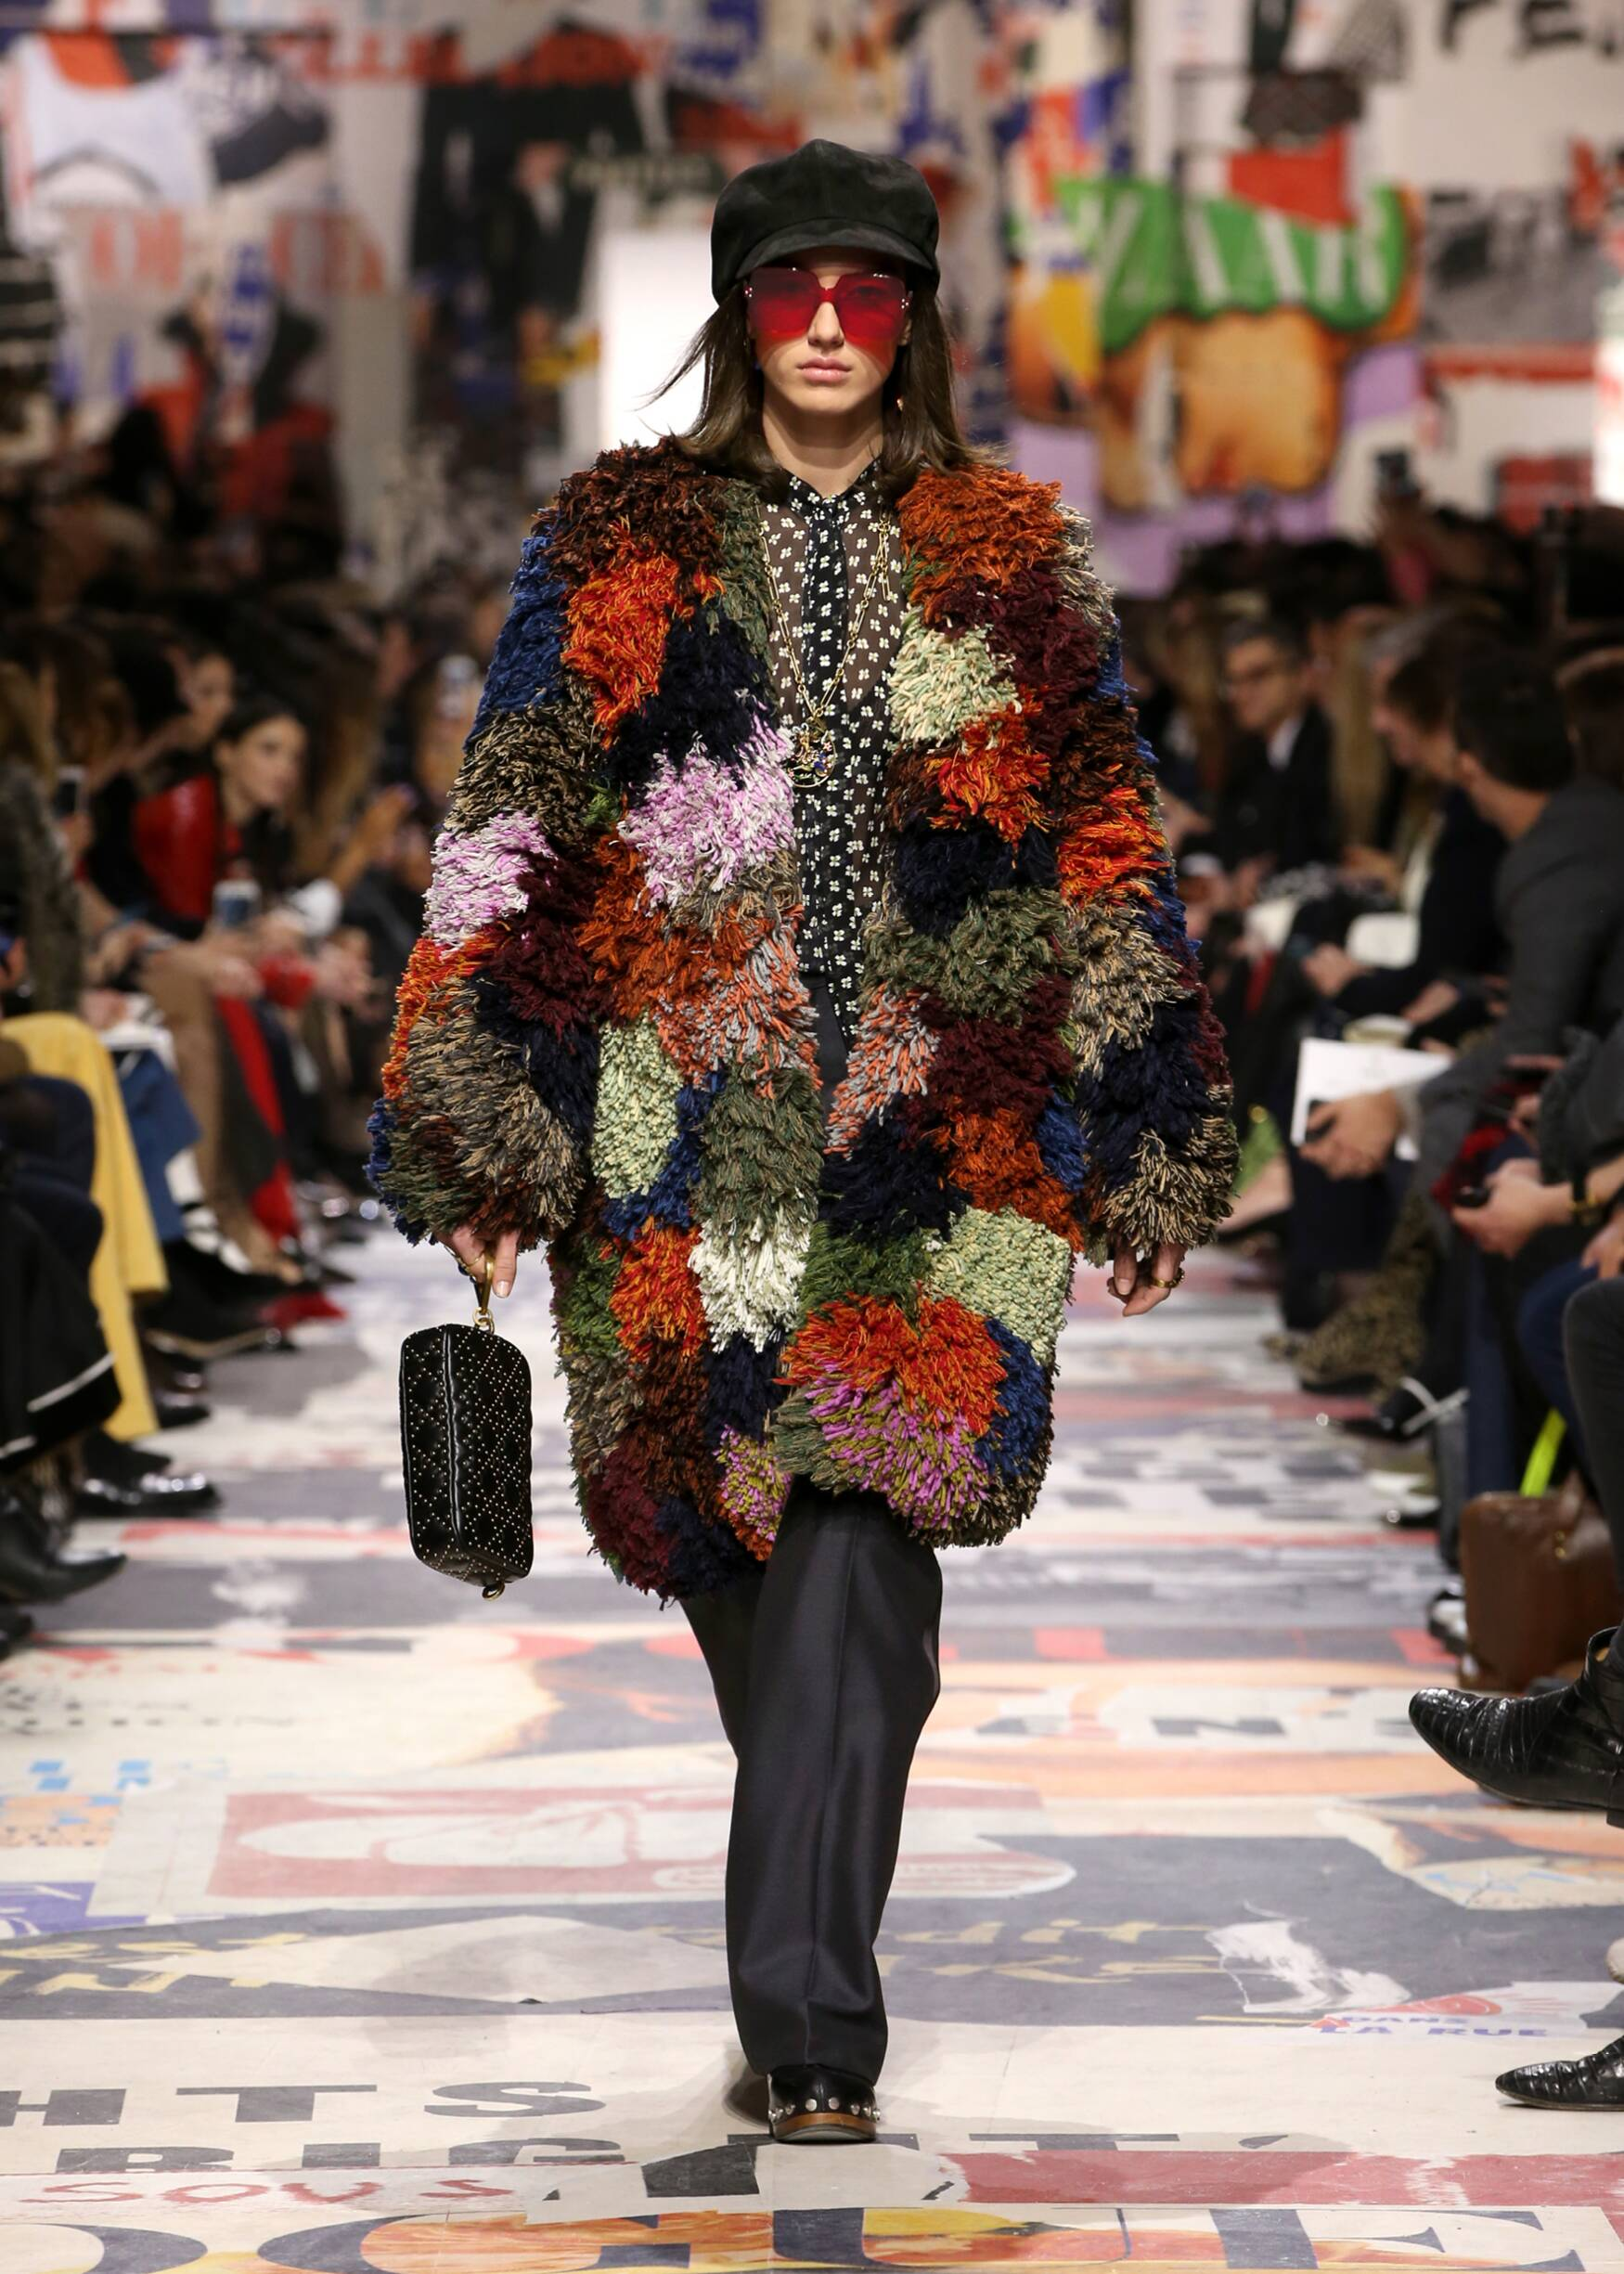 2018 Dior Woman Winter Catwalk